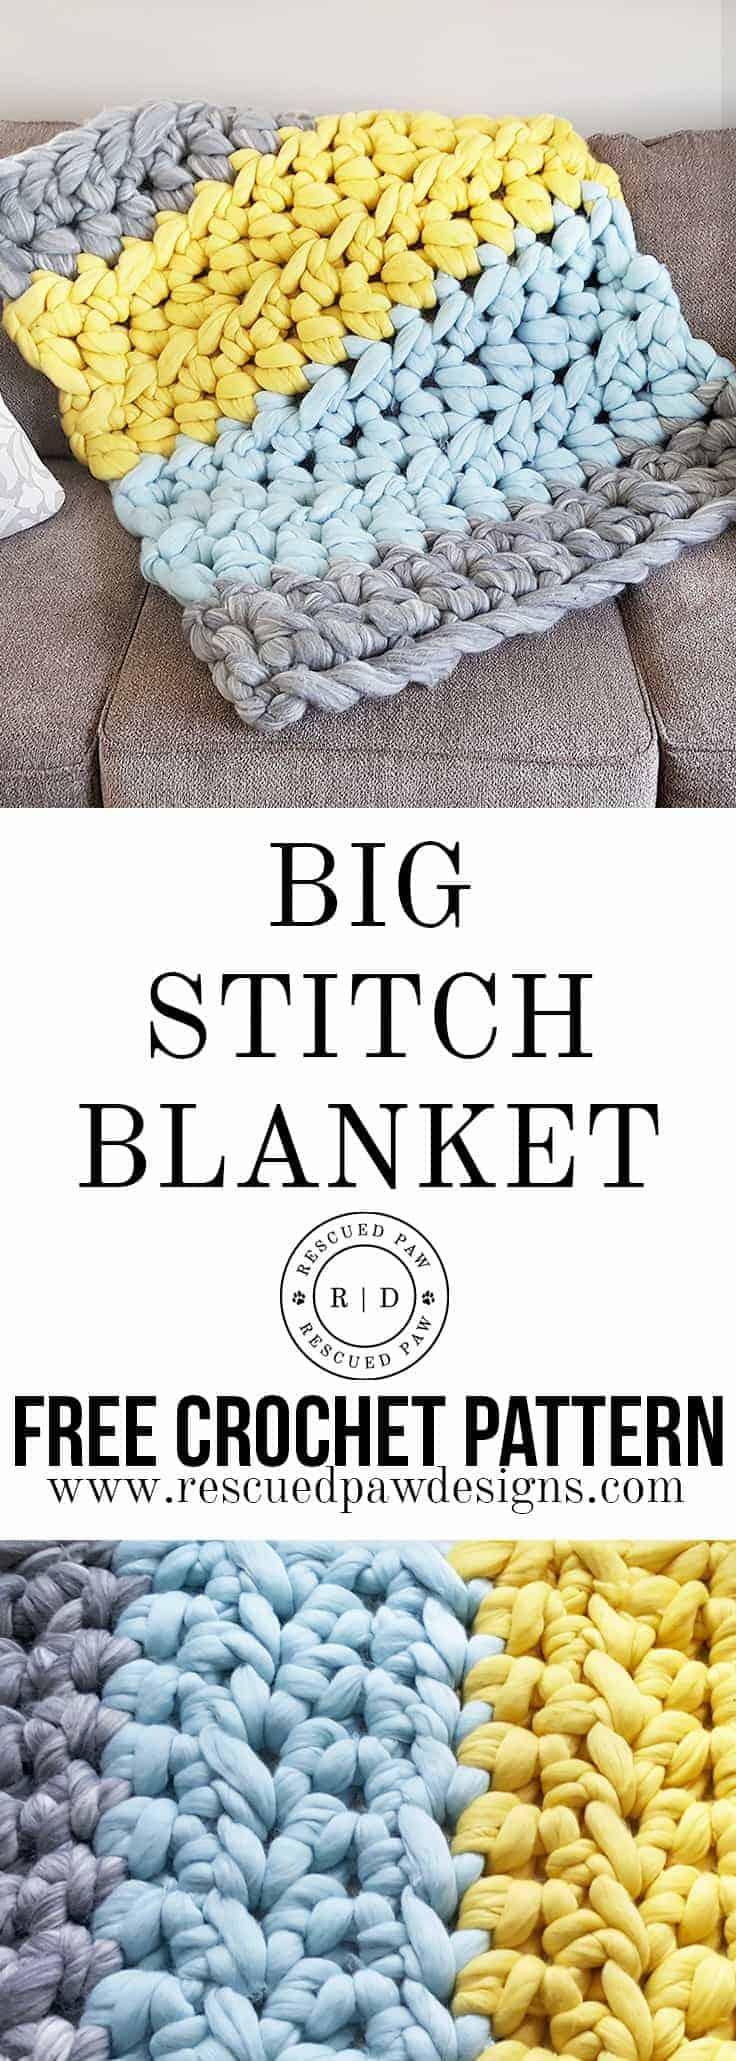 Extreme Crochet Blanket Pattern